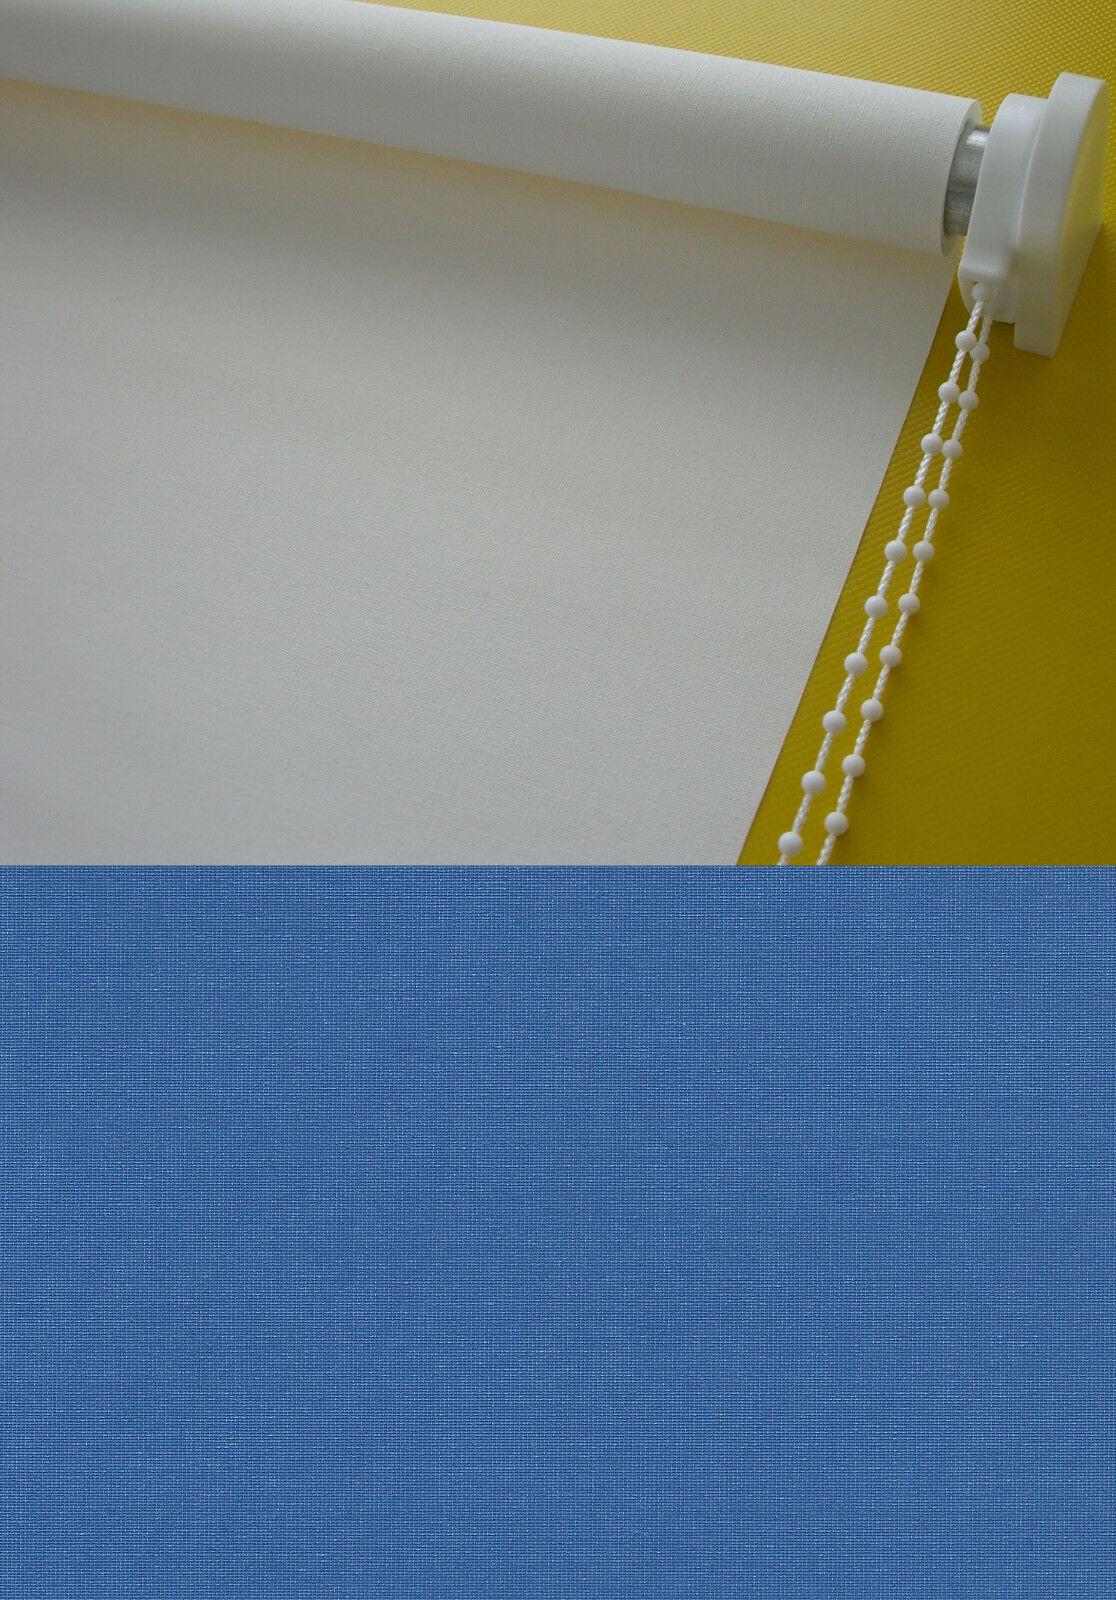 Seitenzugrollo Kettenzugrollo Fenster Rollo Blau Breite 60 - - - 220 cm Länge 180 cm   Flagship-Store  f7f336